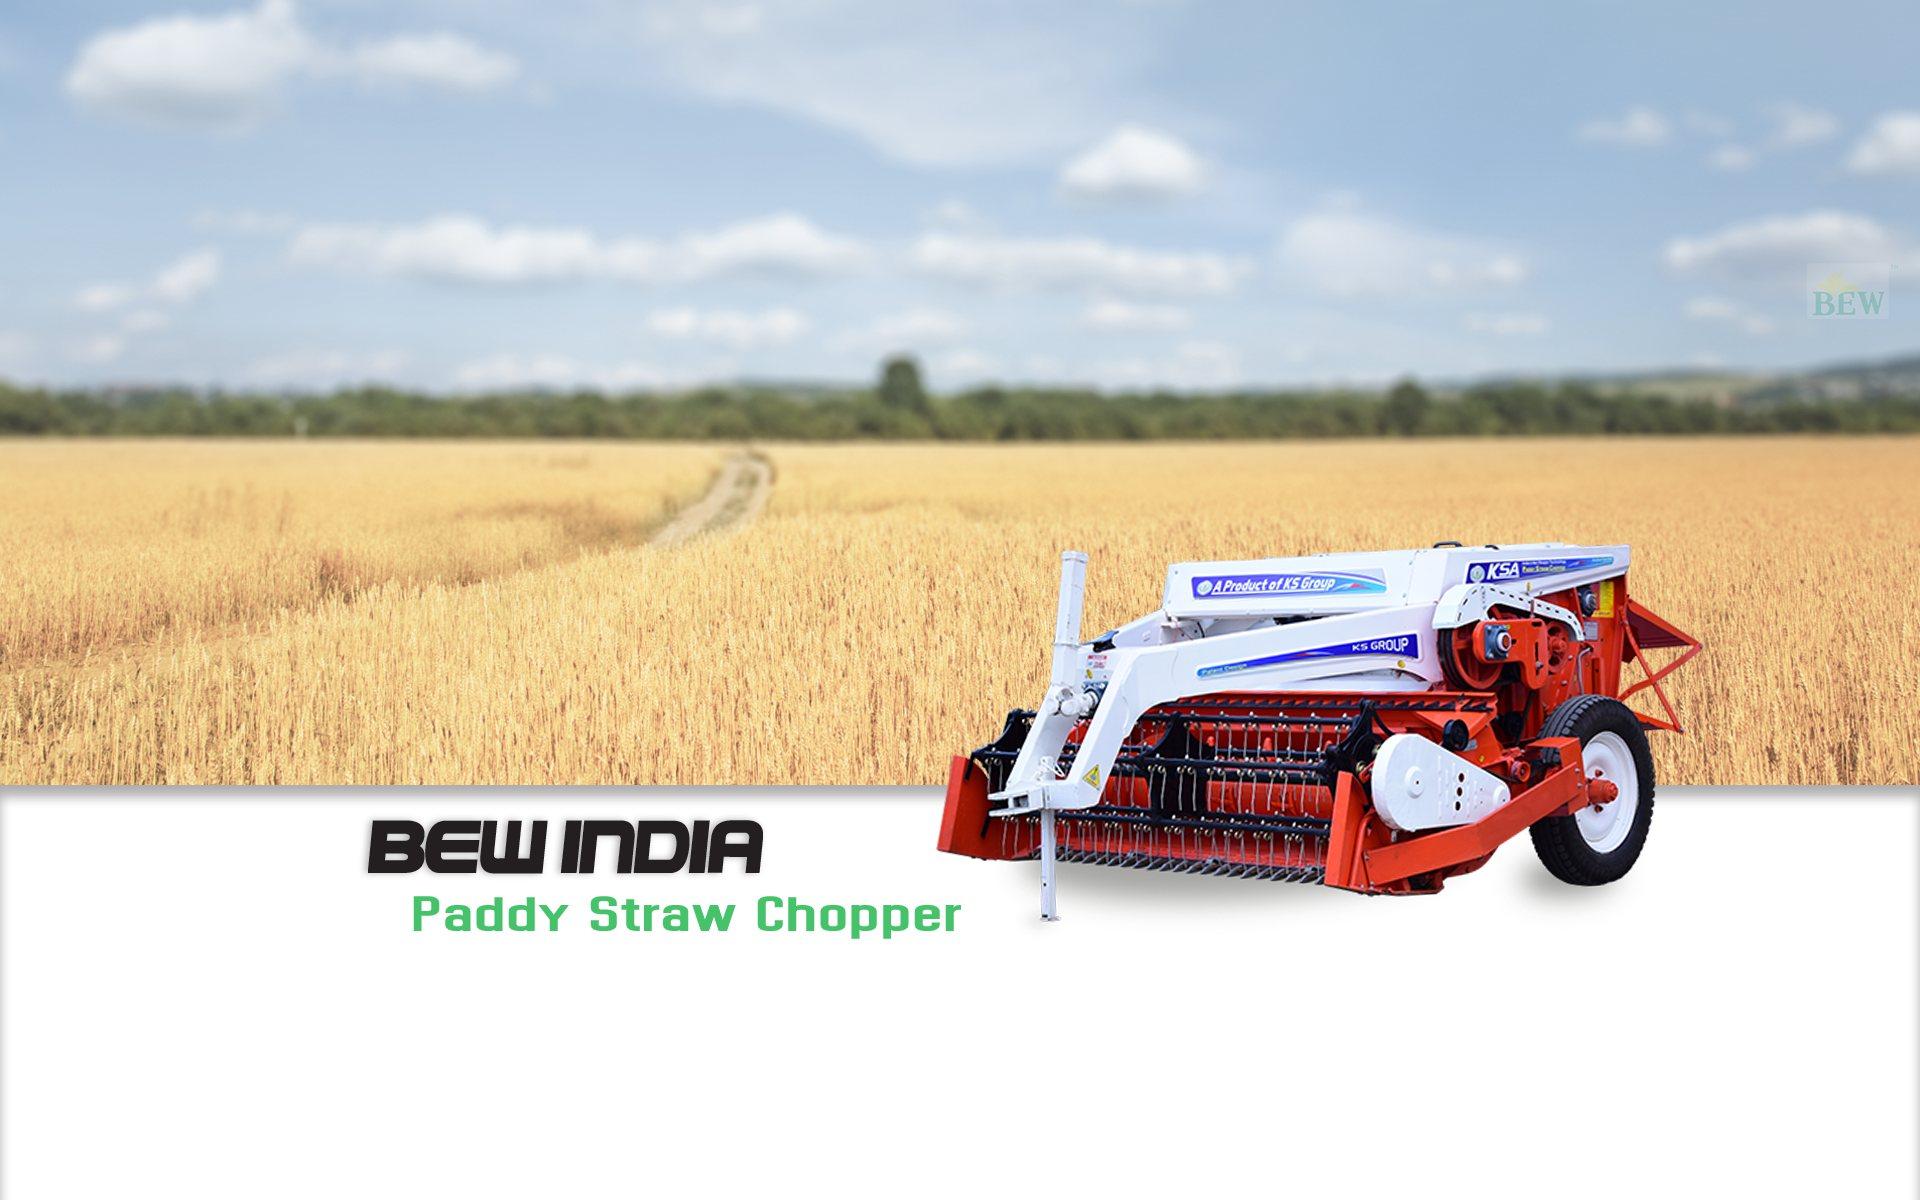 PADDY STRAW CHOPPER